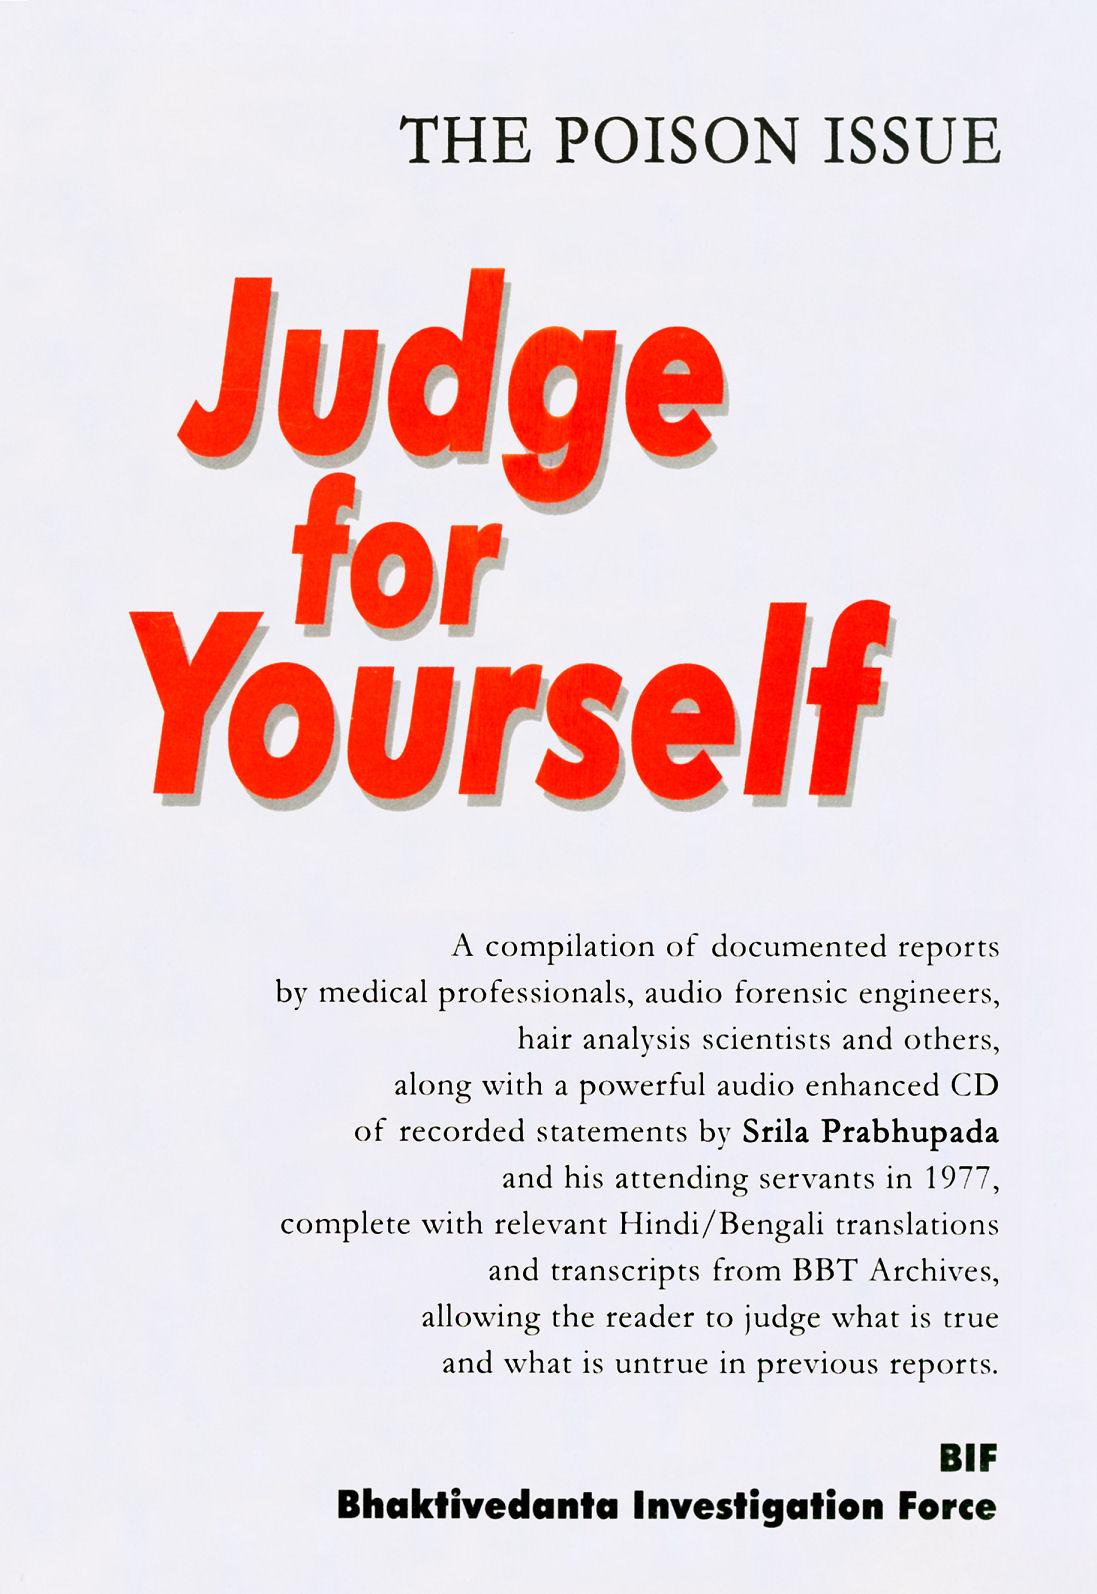 Jfy judge for yourself bif srila prabhupadas poisoning by arsenic fandeluxe Image collections